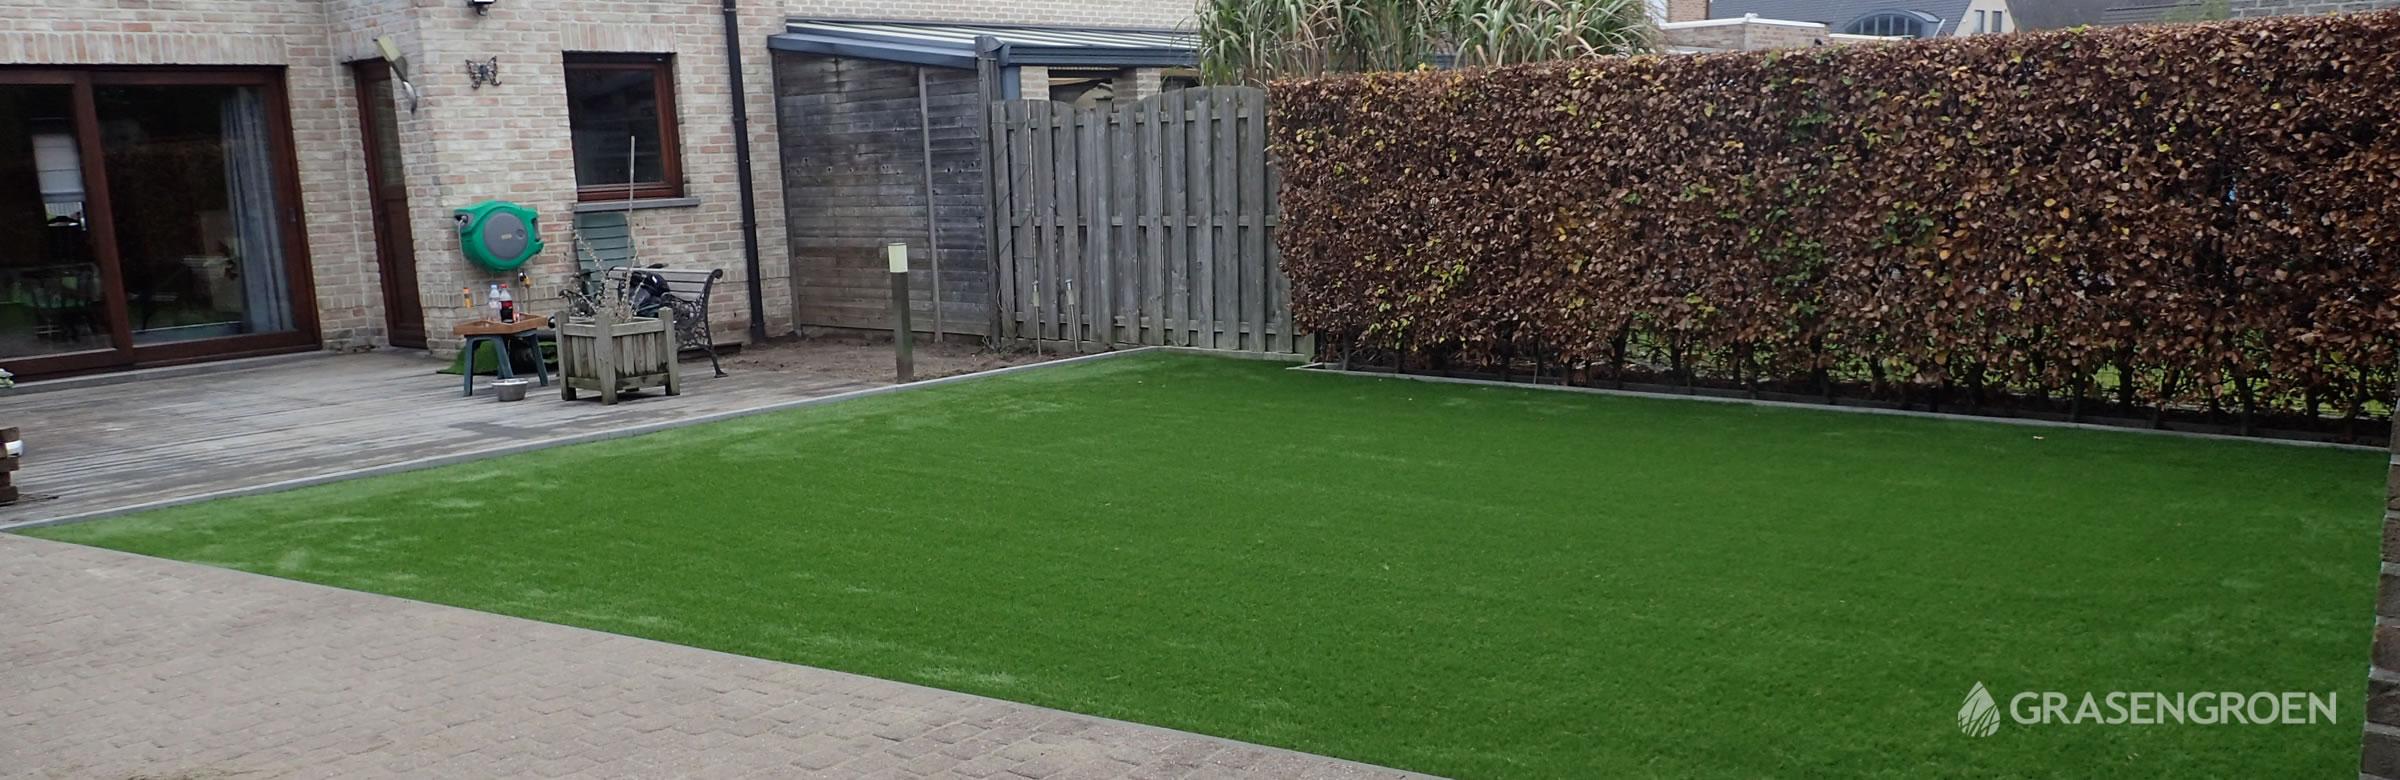 Kunstgrasleggennijlen1 • Gras en Groen Kunstgras